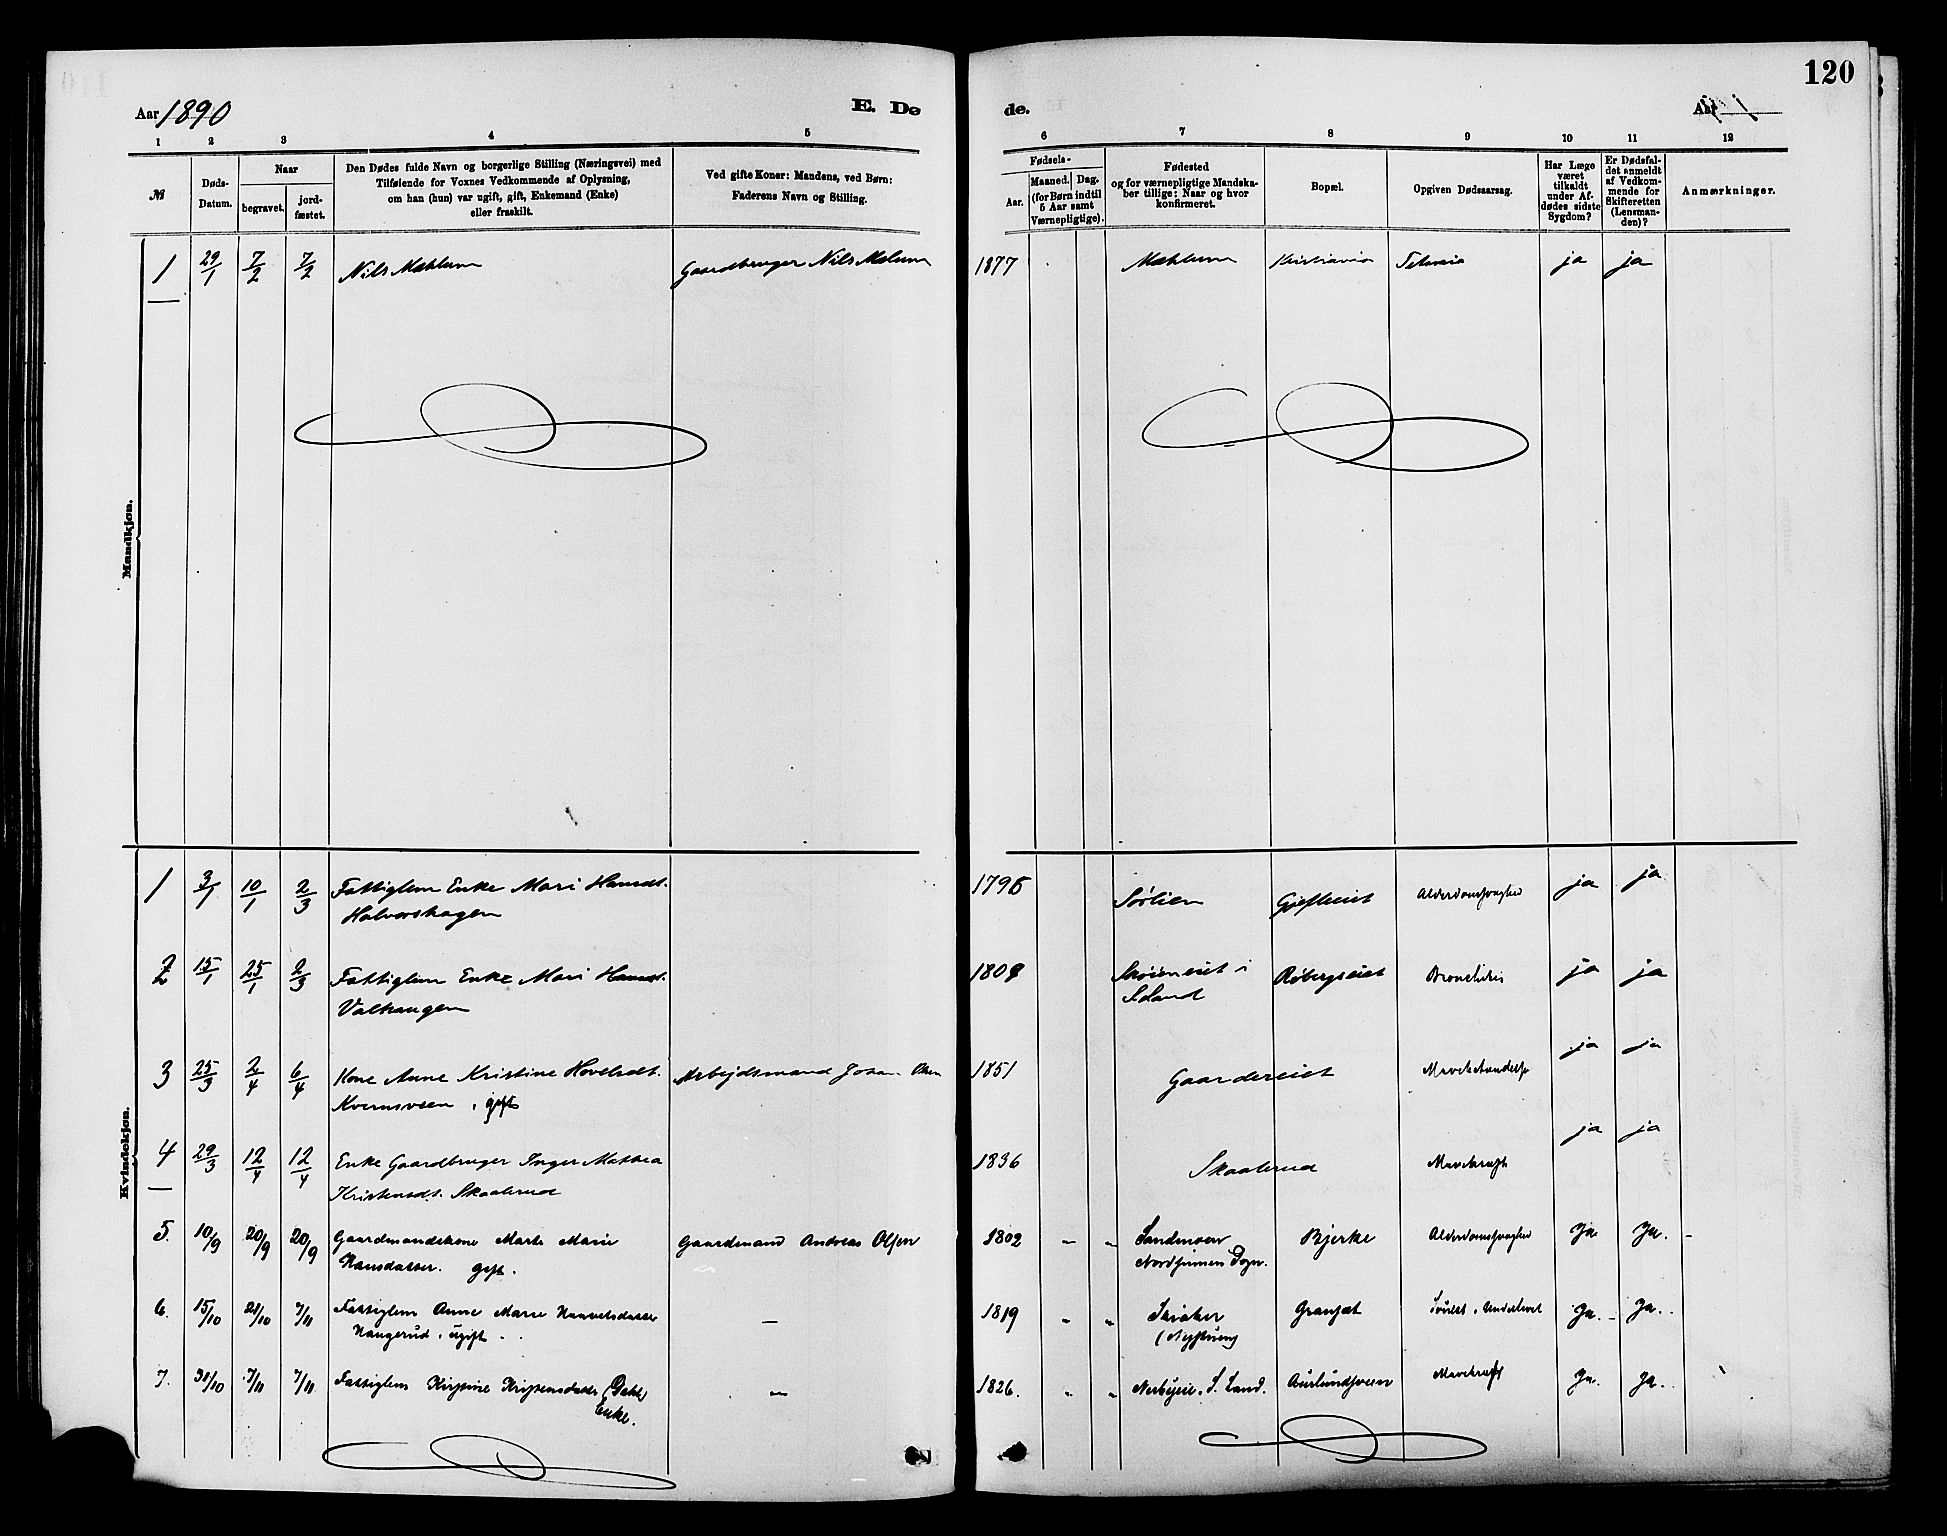 SAH, Nordre Land prestekontor, Ministerialbok nr. 3, 1882-1896, s. 120